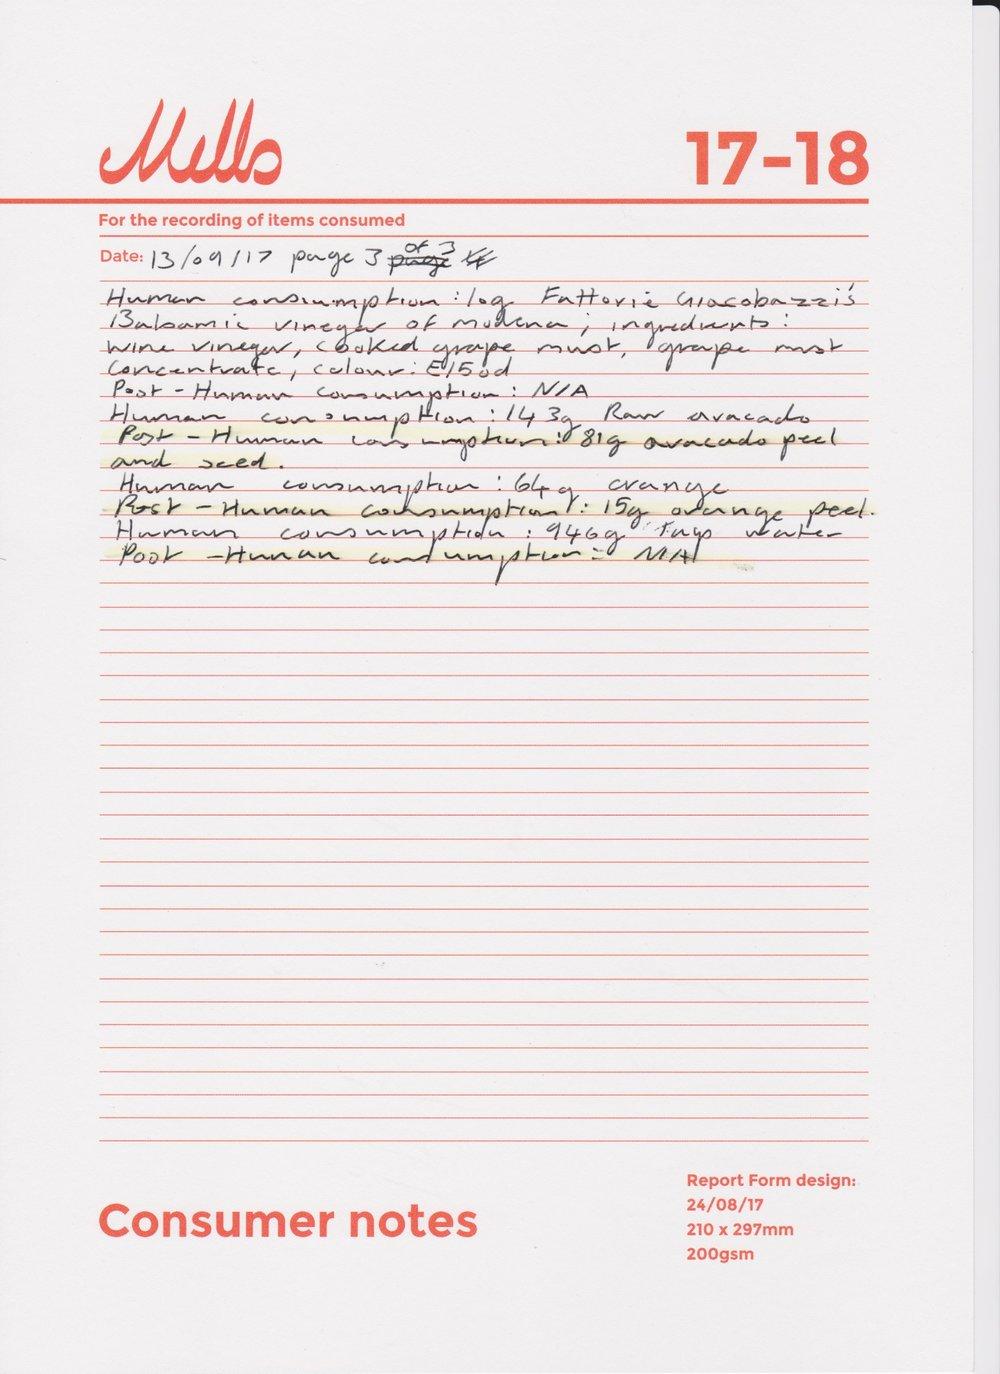 Steven Mills Consumer notes 130917 pg3 of 3.jpeg